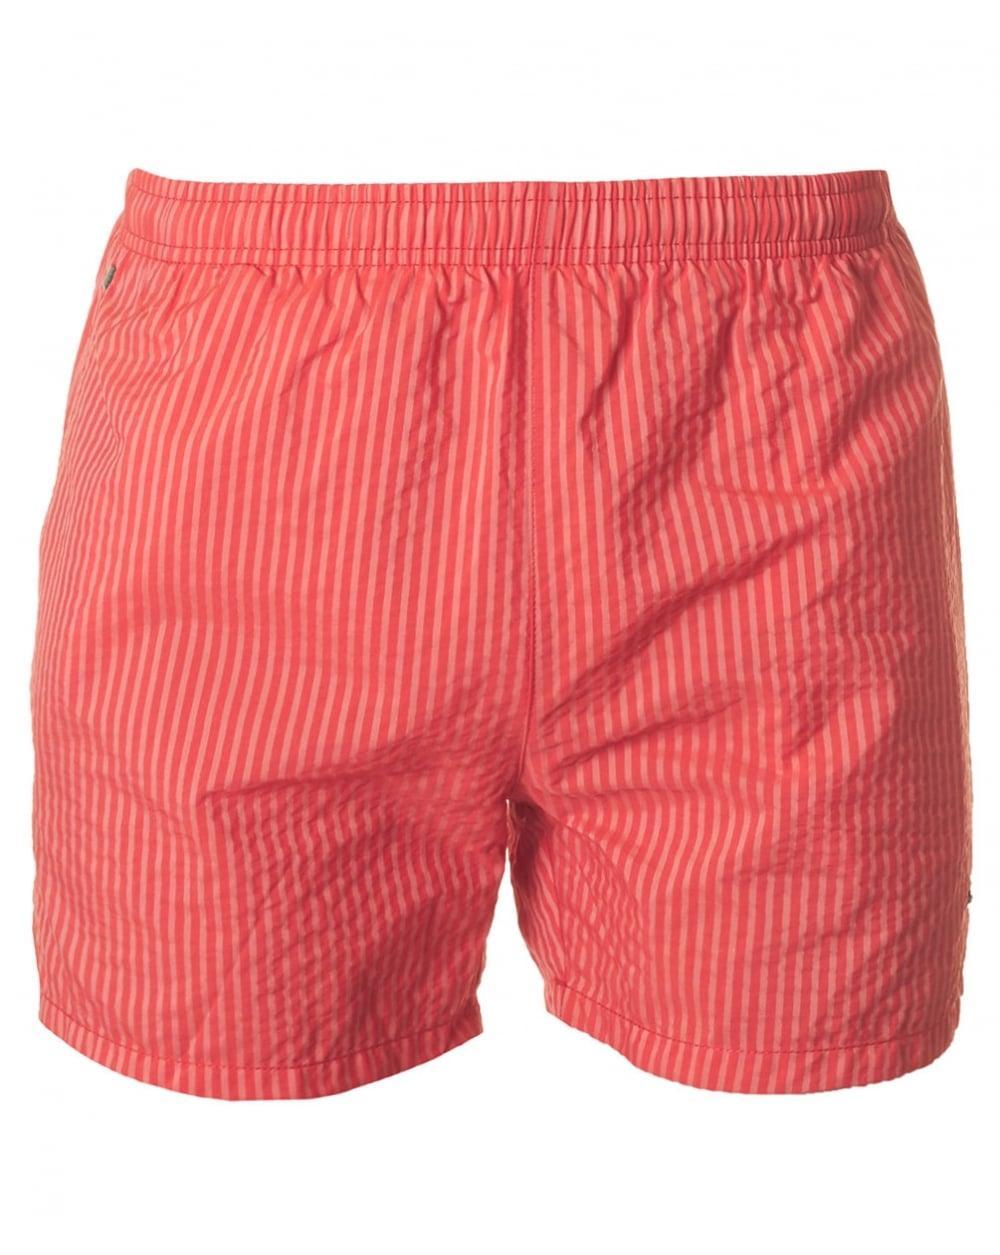 Lyst boss black tuna fish swim shorts in red for men for Fishing swim trunks